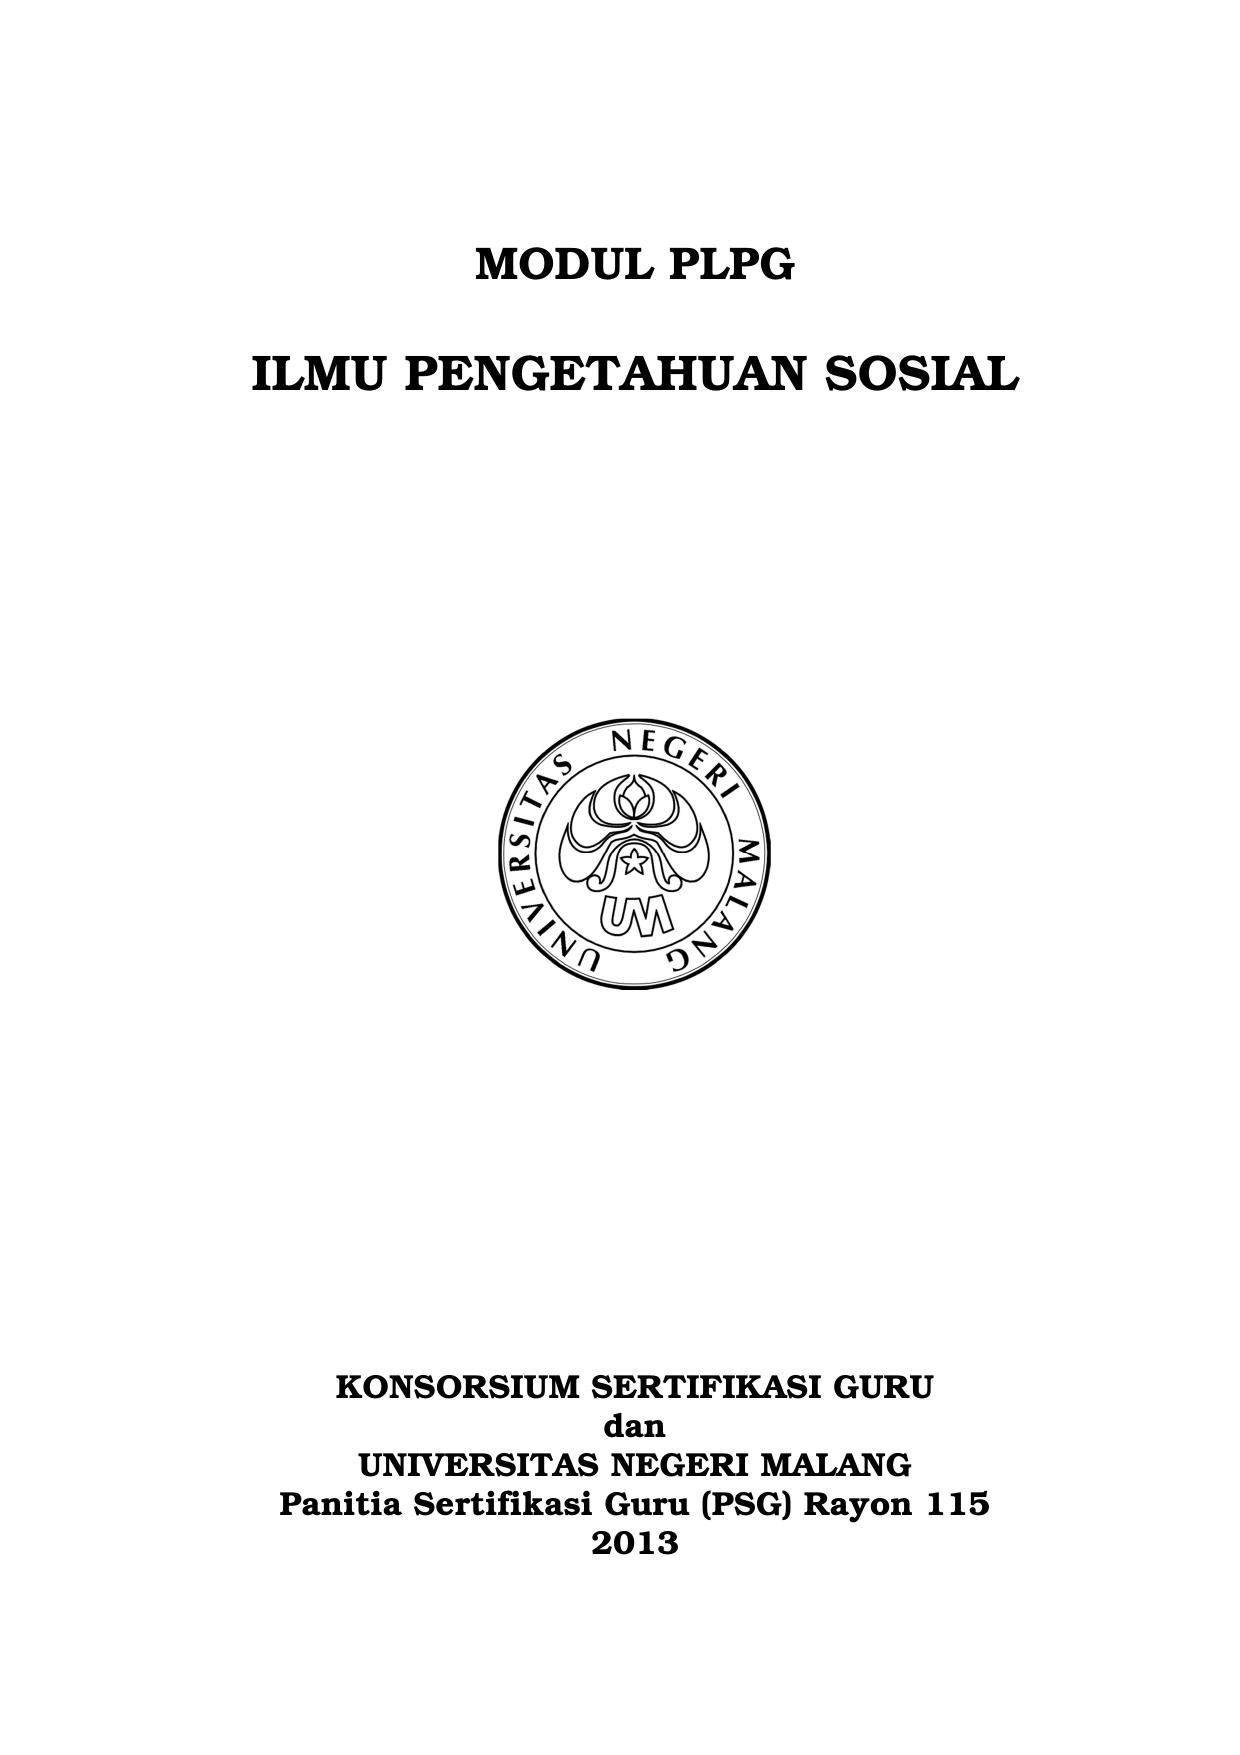 IPS Panitia Sertifikasi Guru Rayon 115